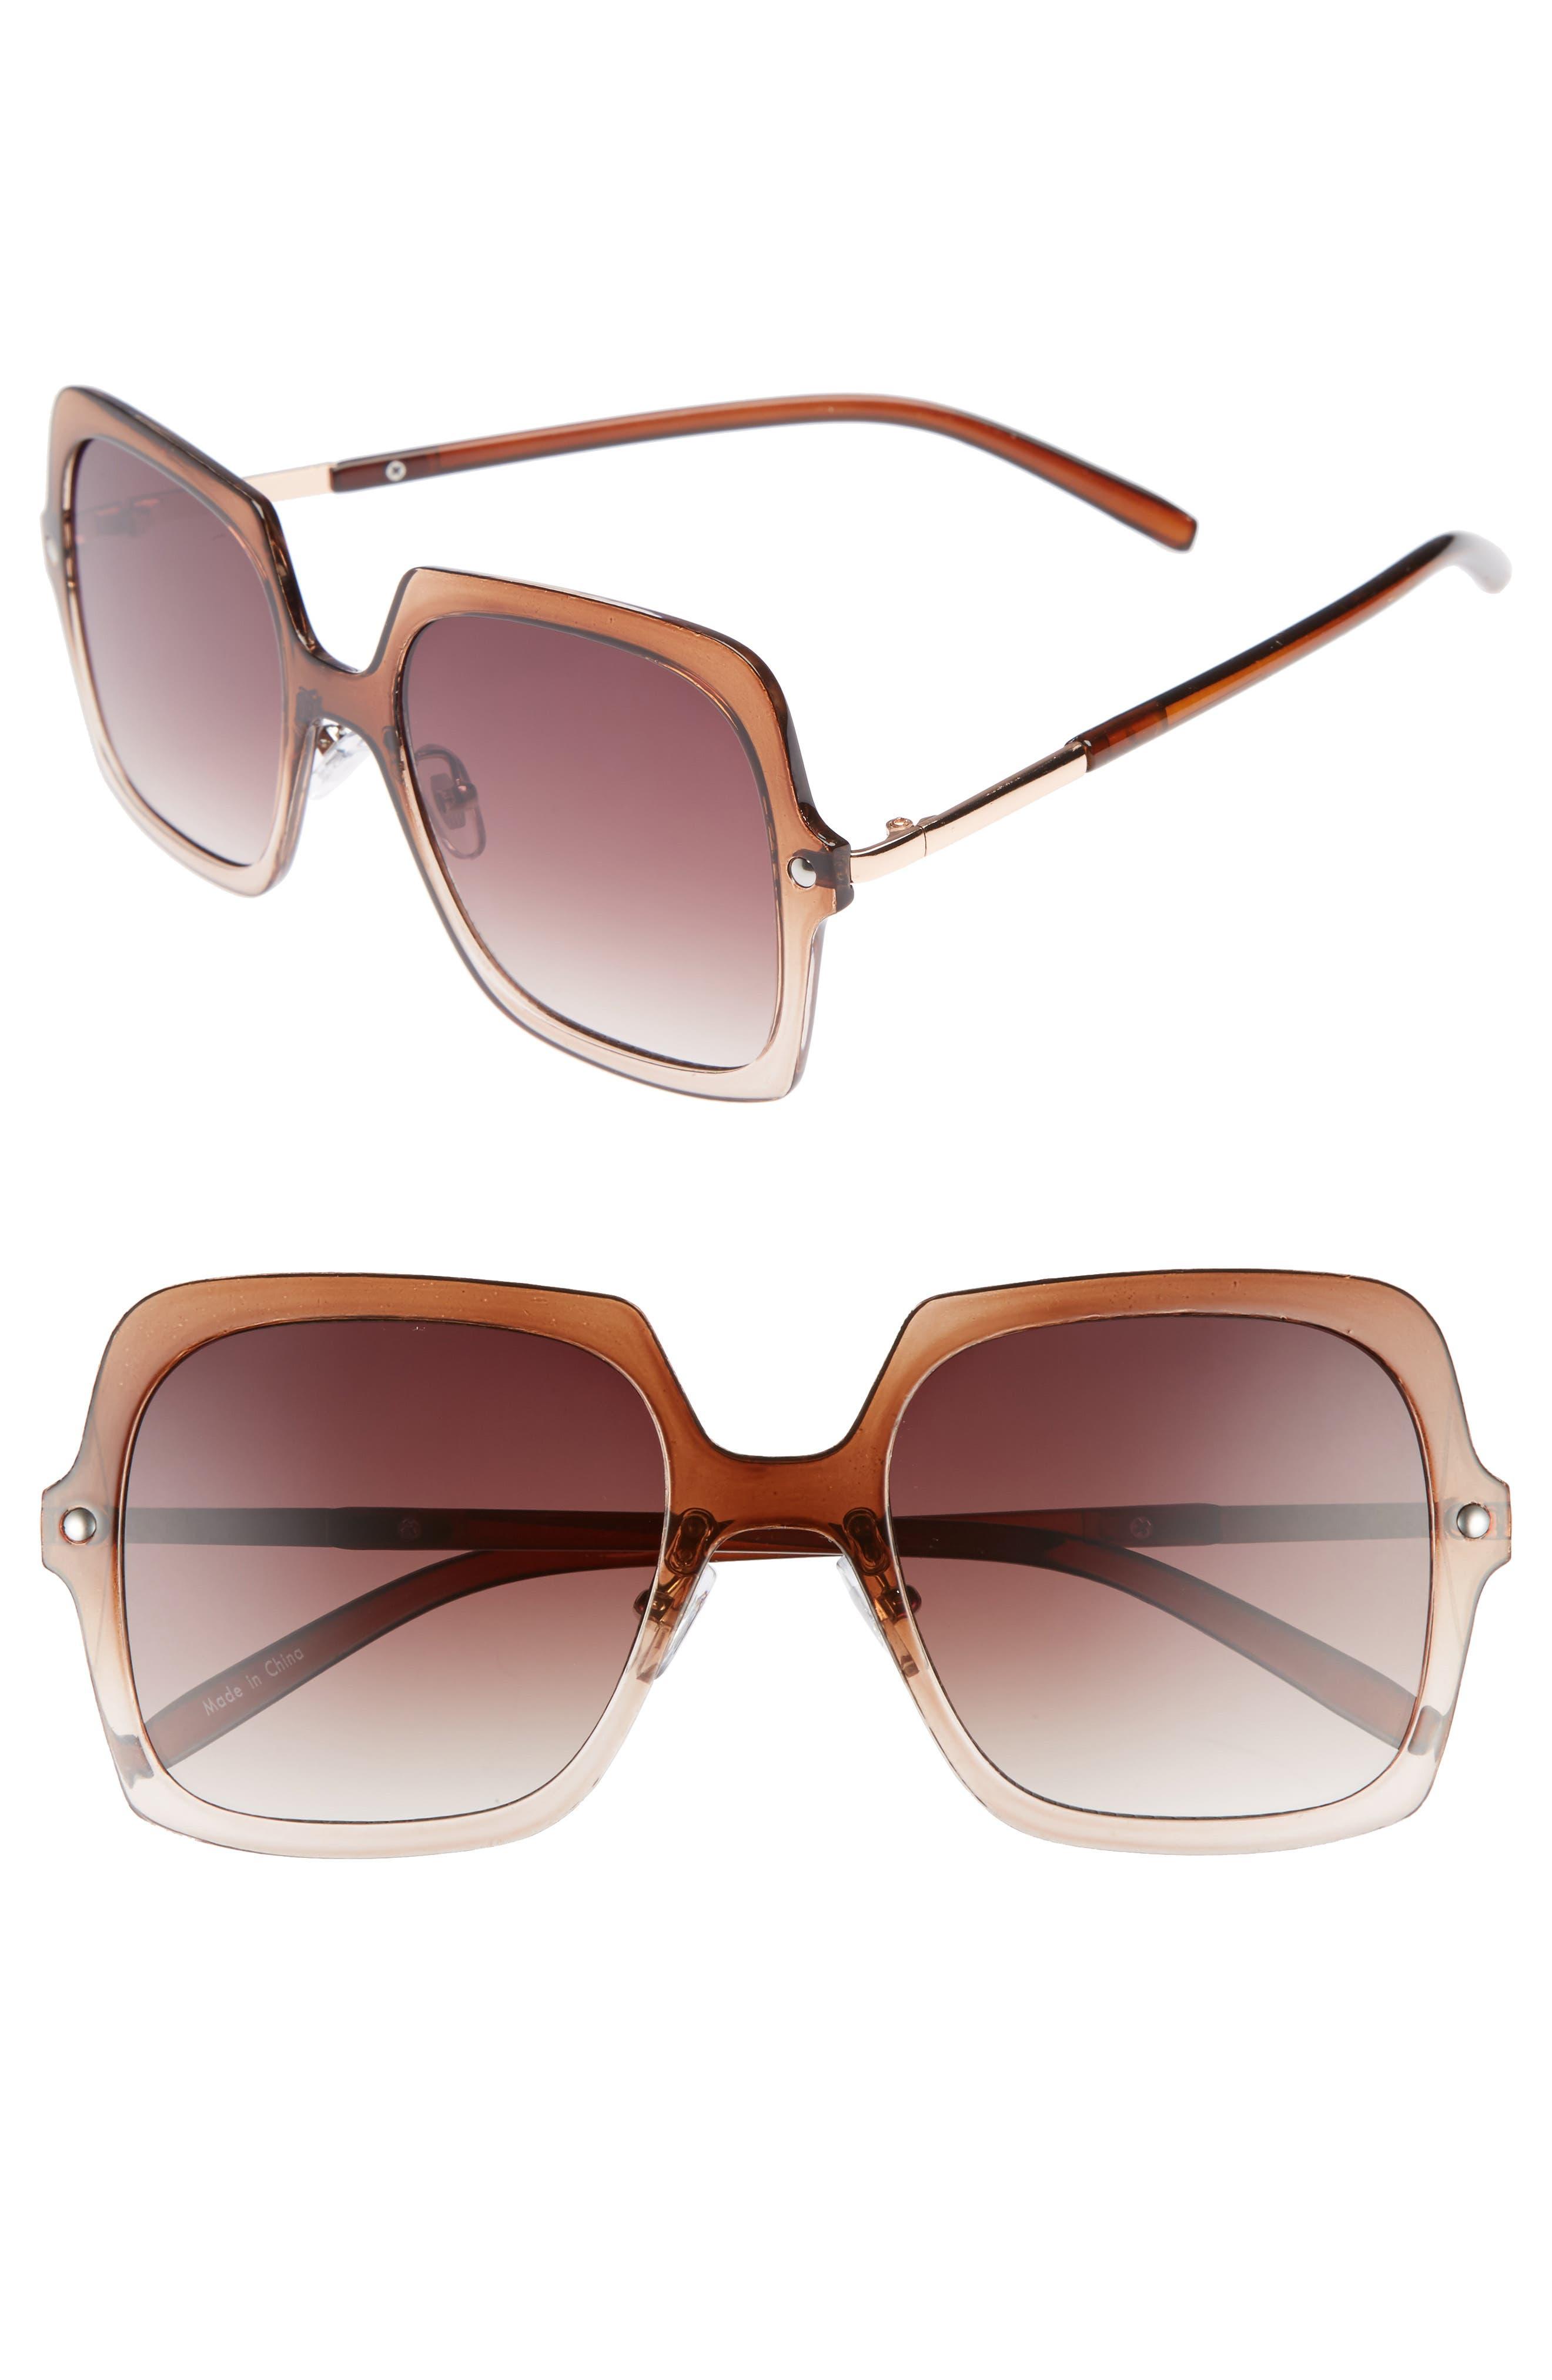 Translucent Square Sunglasses,                         Main,                         color, 200